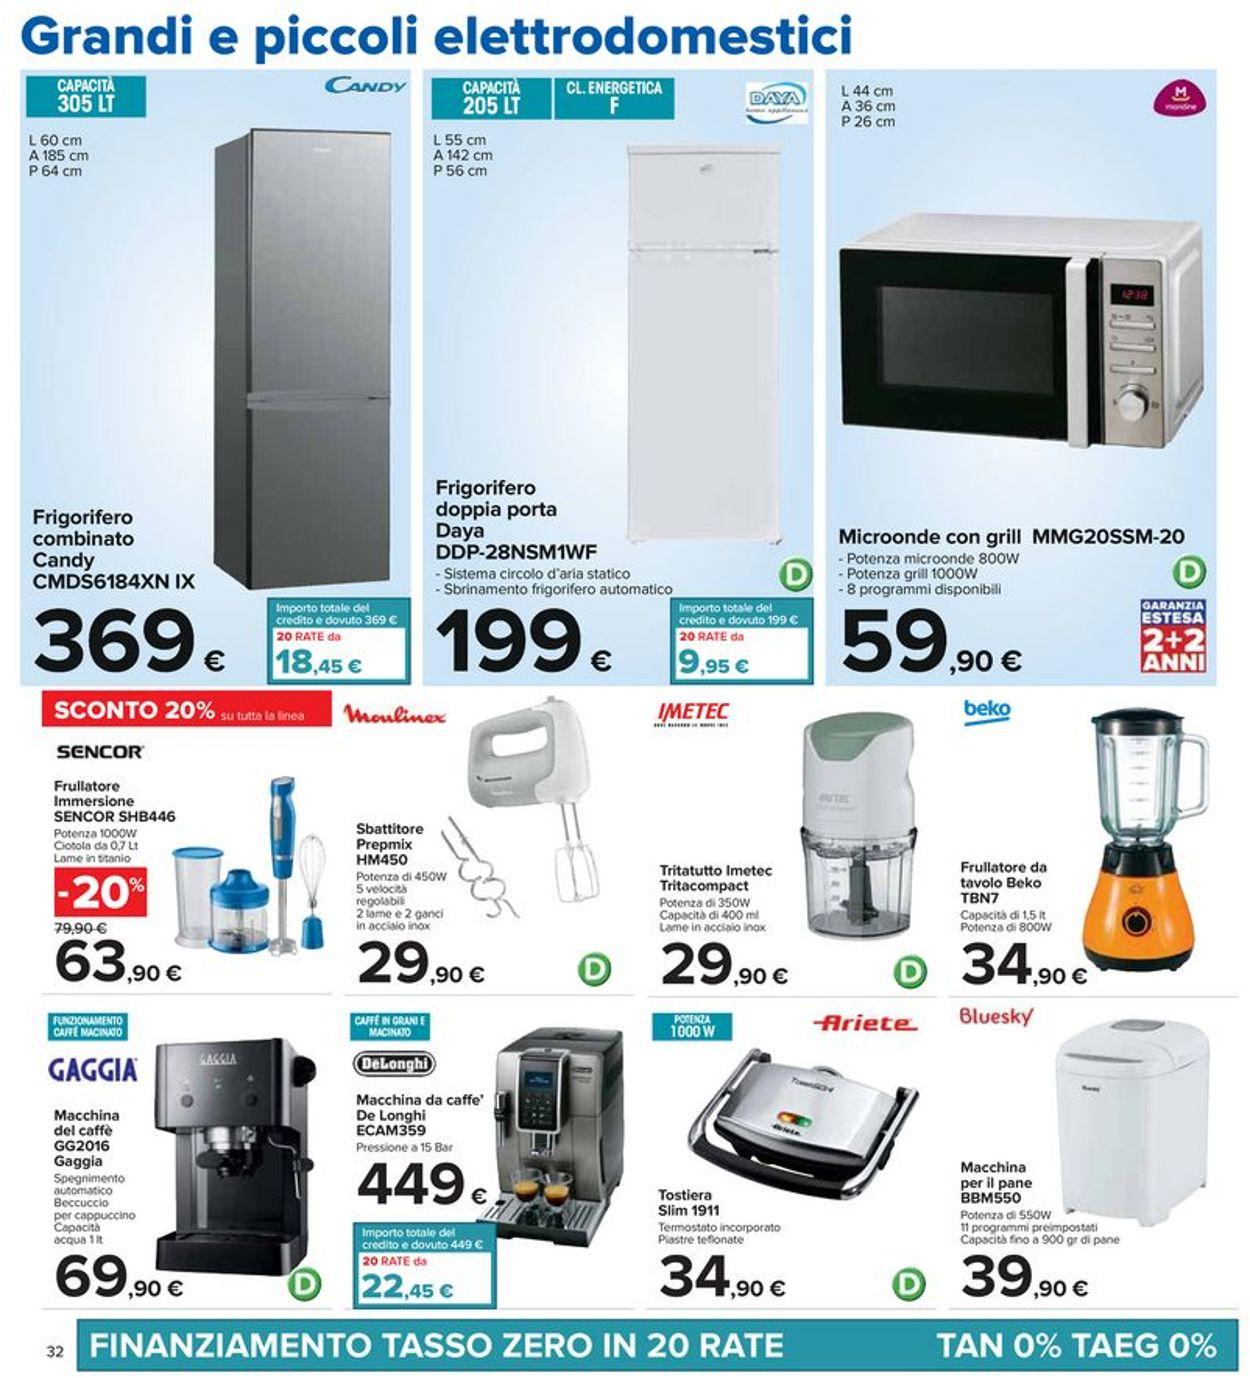 Volantino Carrefour - Offerte 06/05-19/05/2021 (Pagina 32)